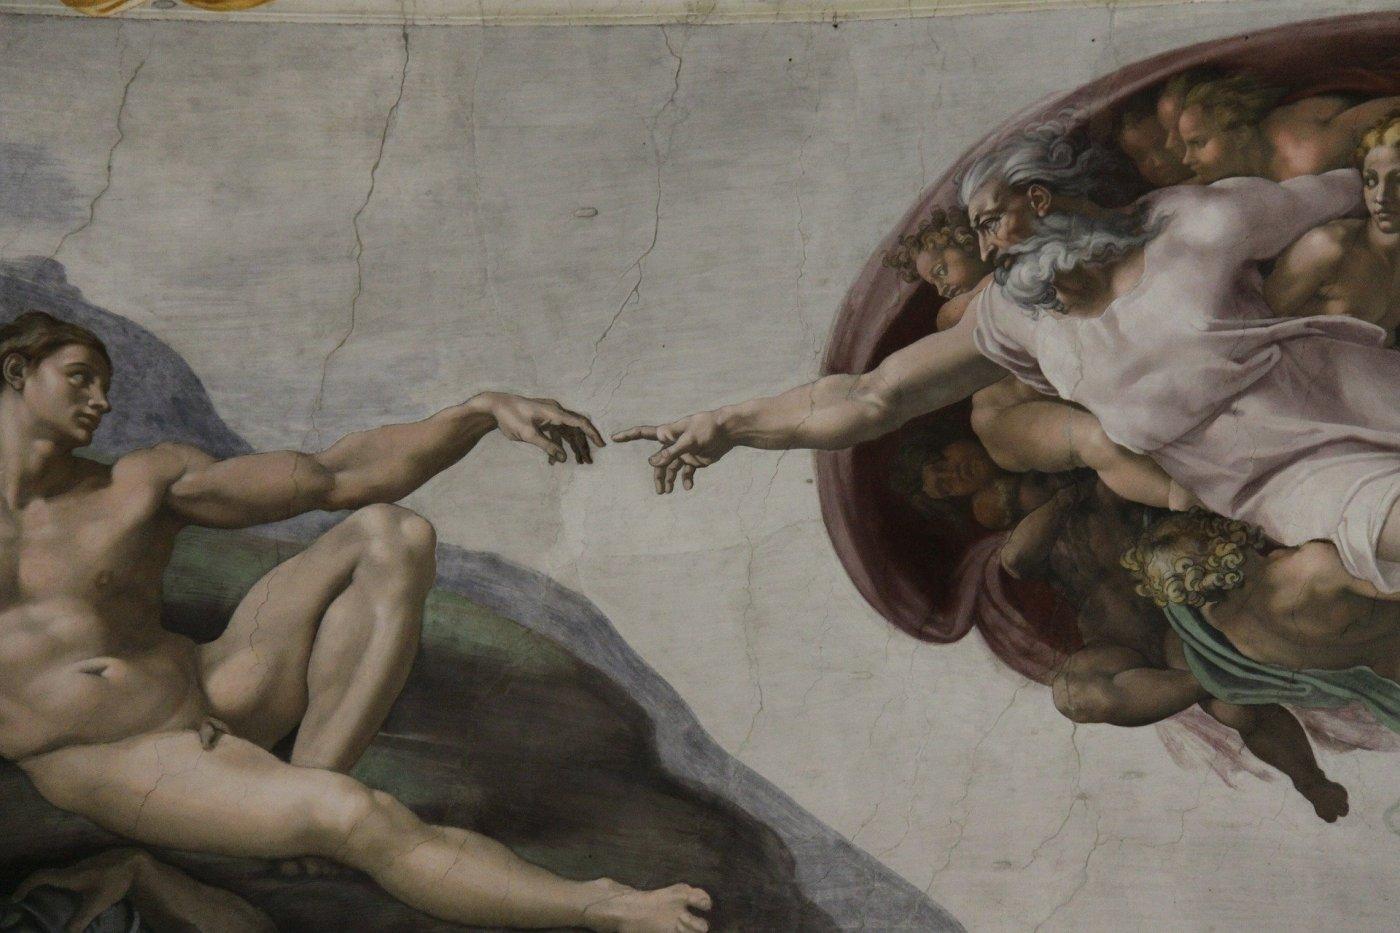 The Creation of Adam by Michelangelo, Sistine Chapel, Vatican City